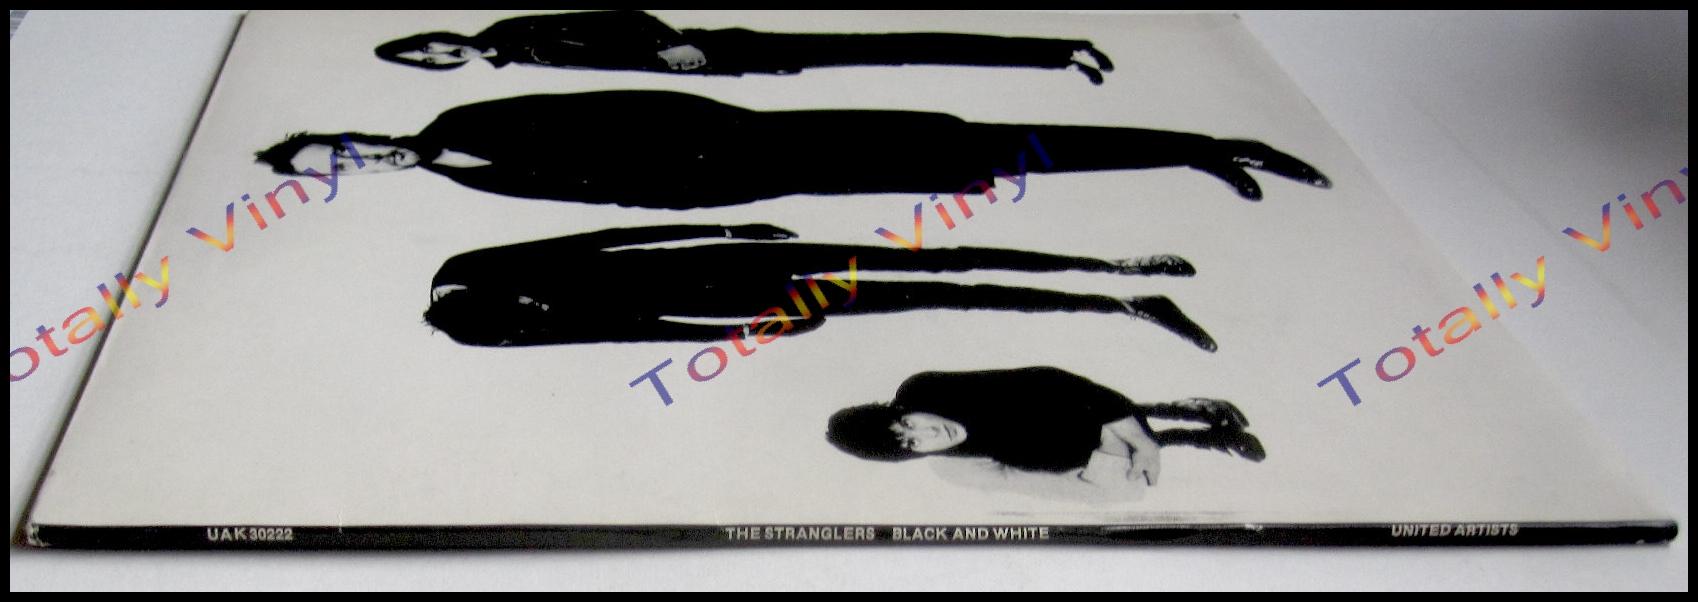 Totally Vinyl Records Stranglers The Black And White